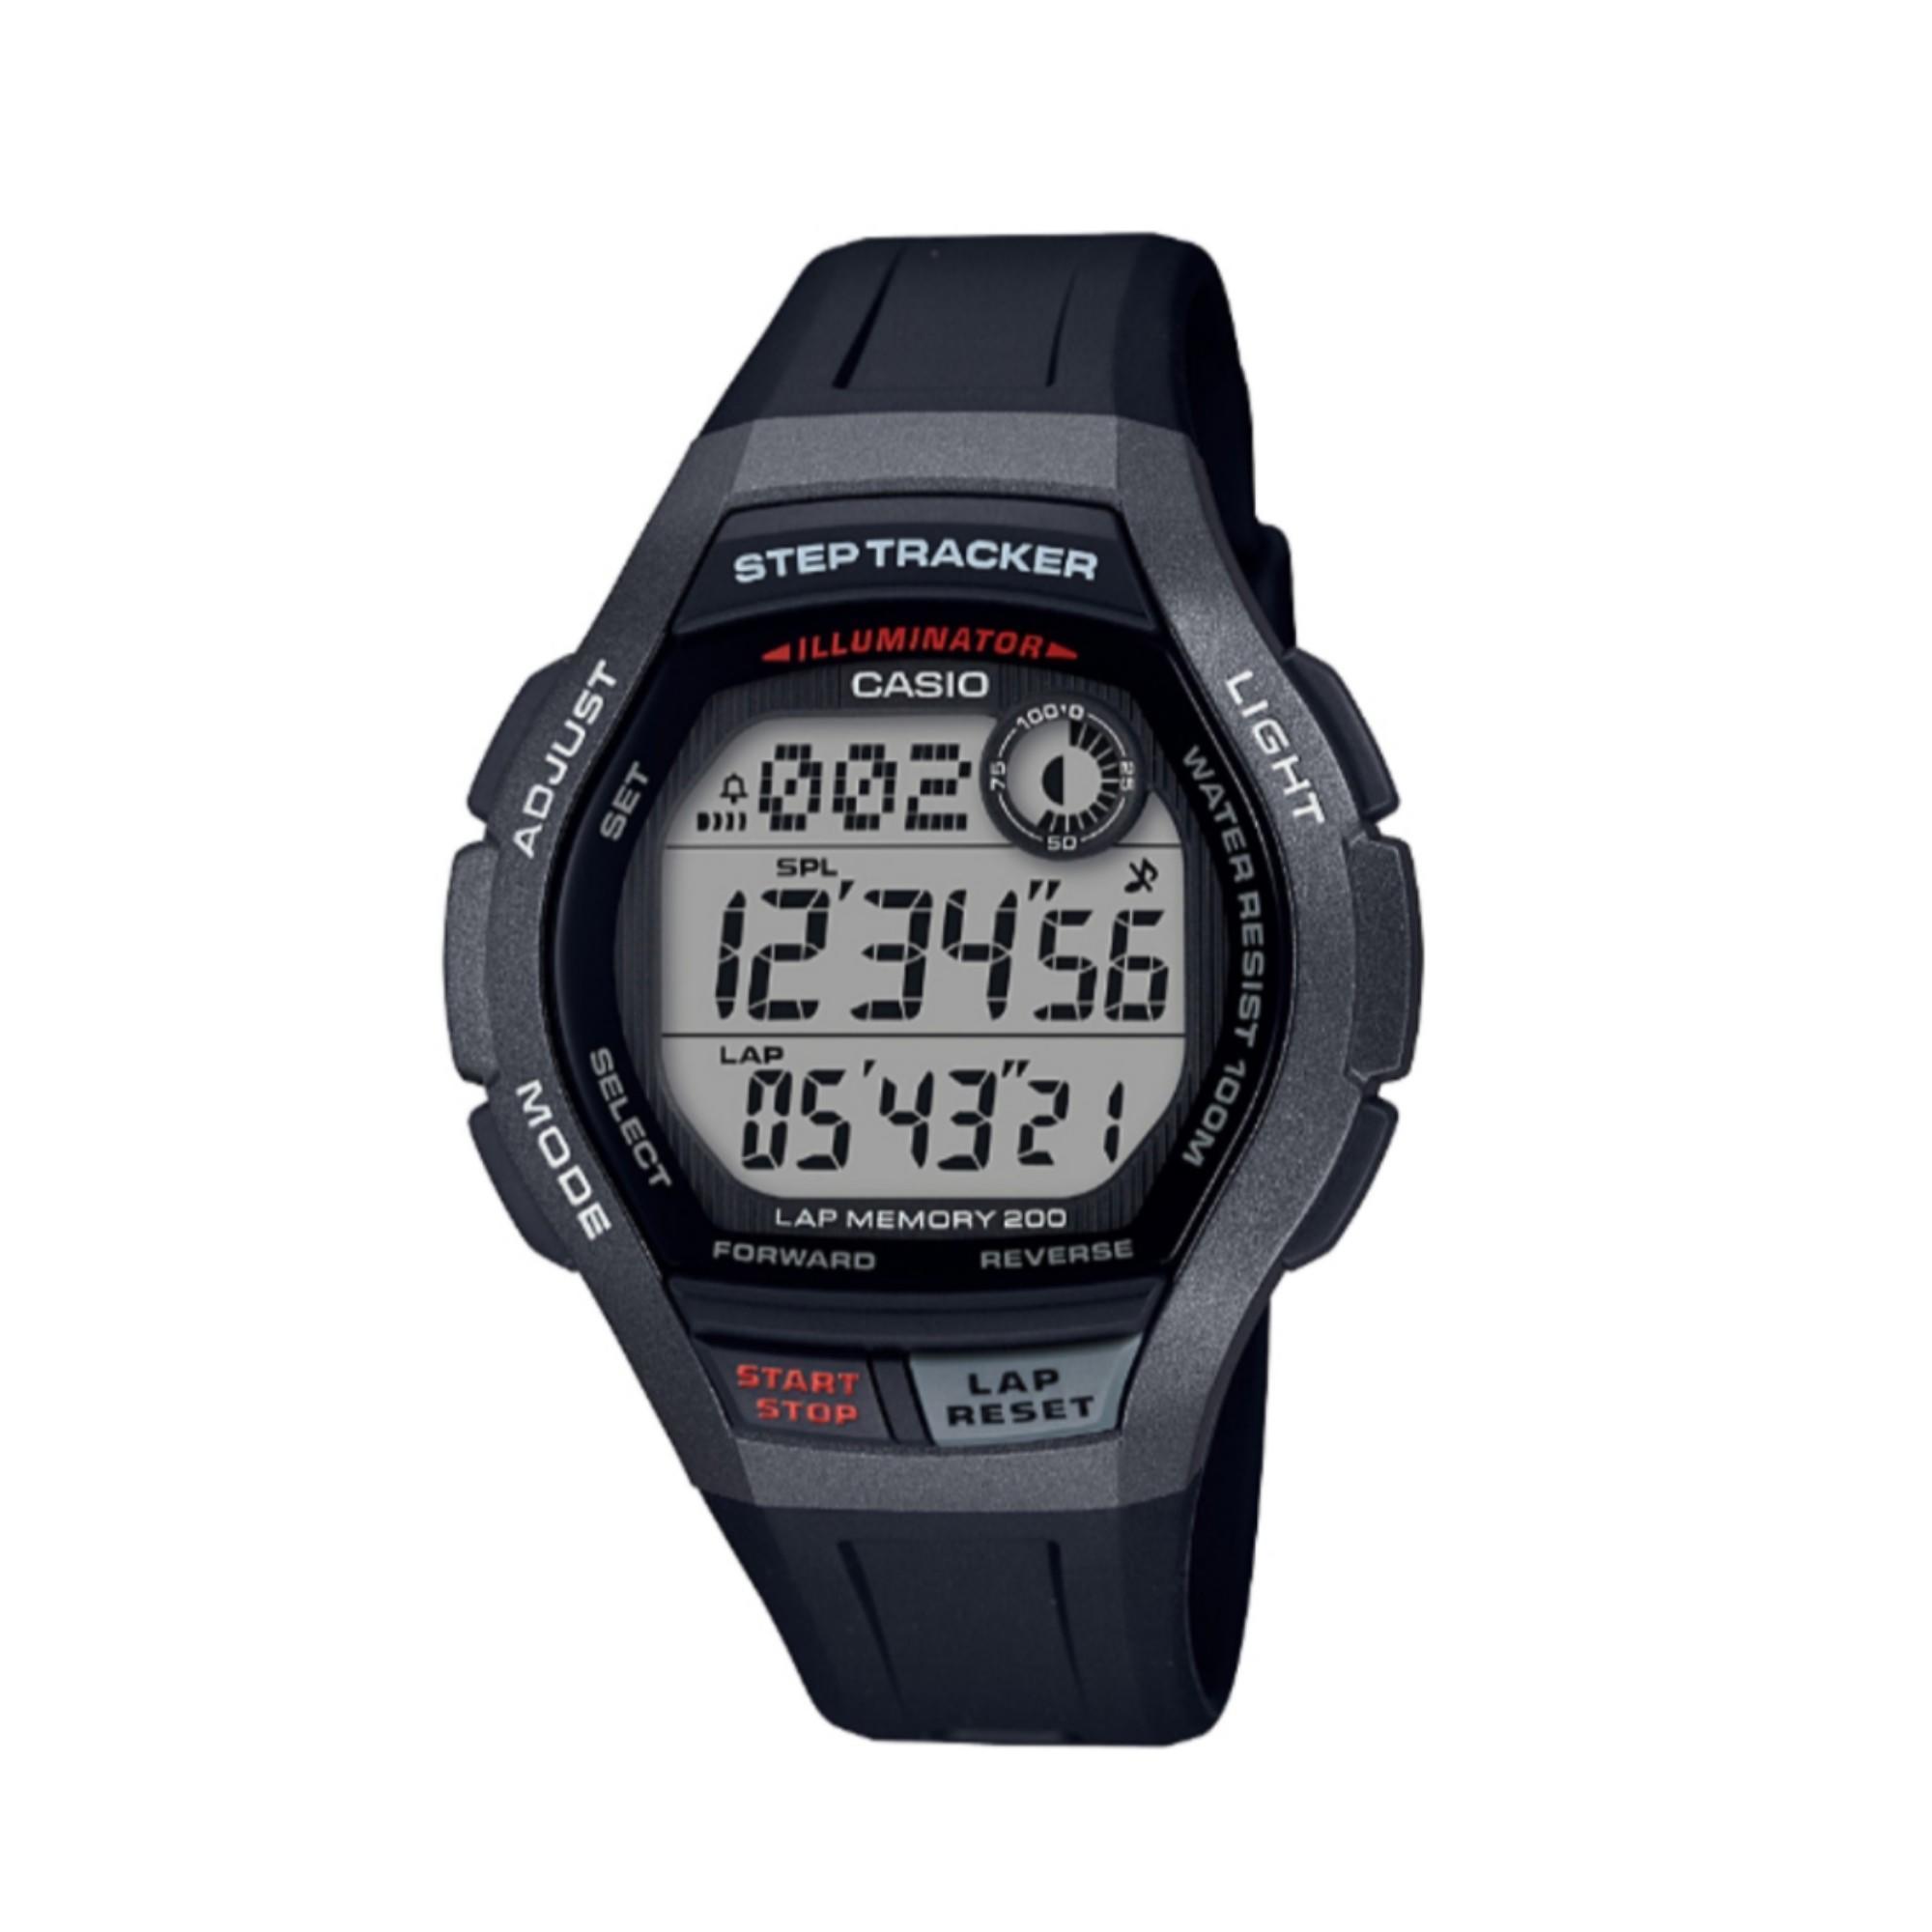 e7d8966e015f Reloj Cronómetro Running Casio WS-2000H-1AVEF Negro Gris Casio ...